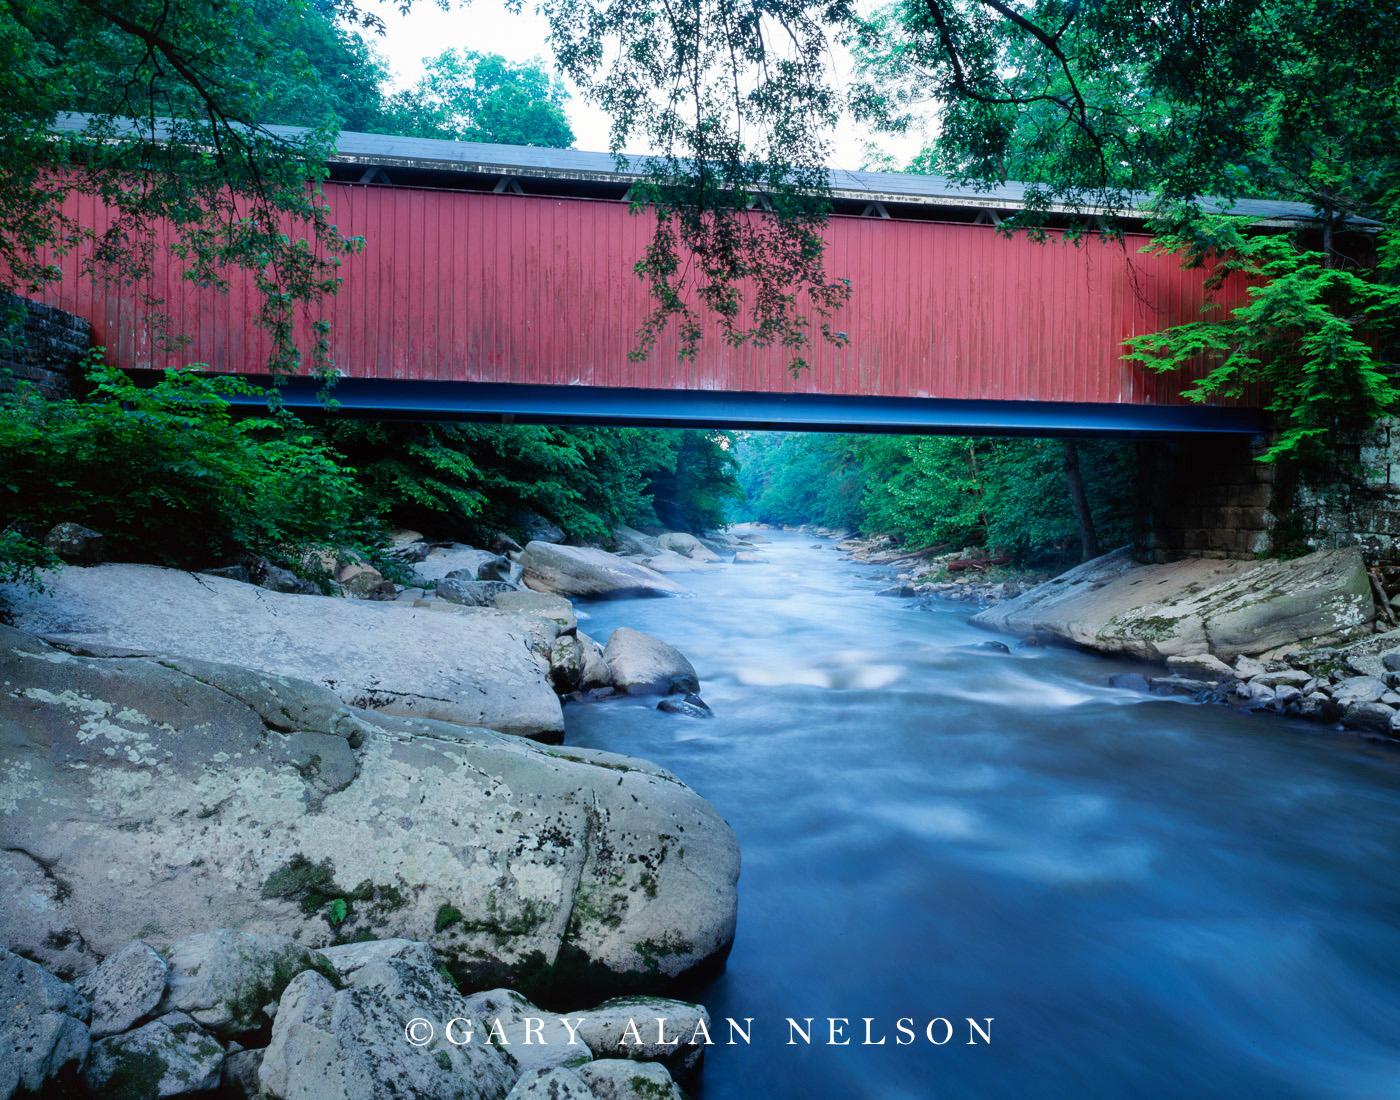 pennsylvania, state park, covered bridge, creek, state park, photo